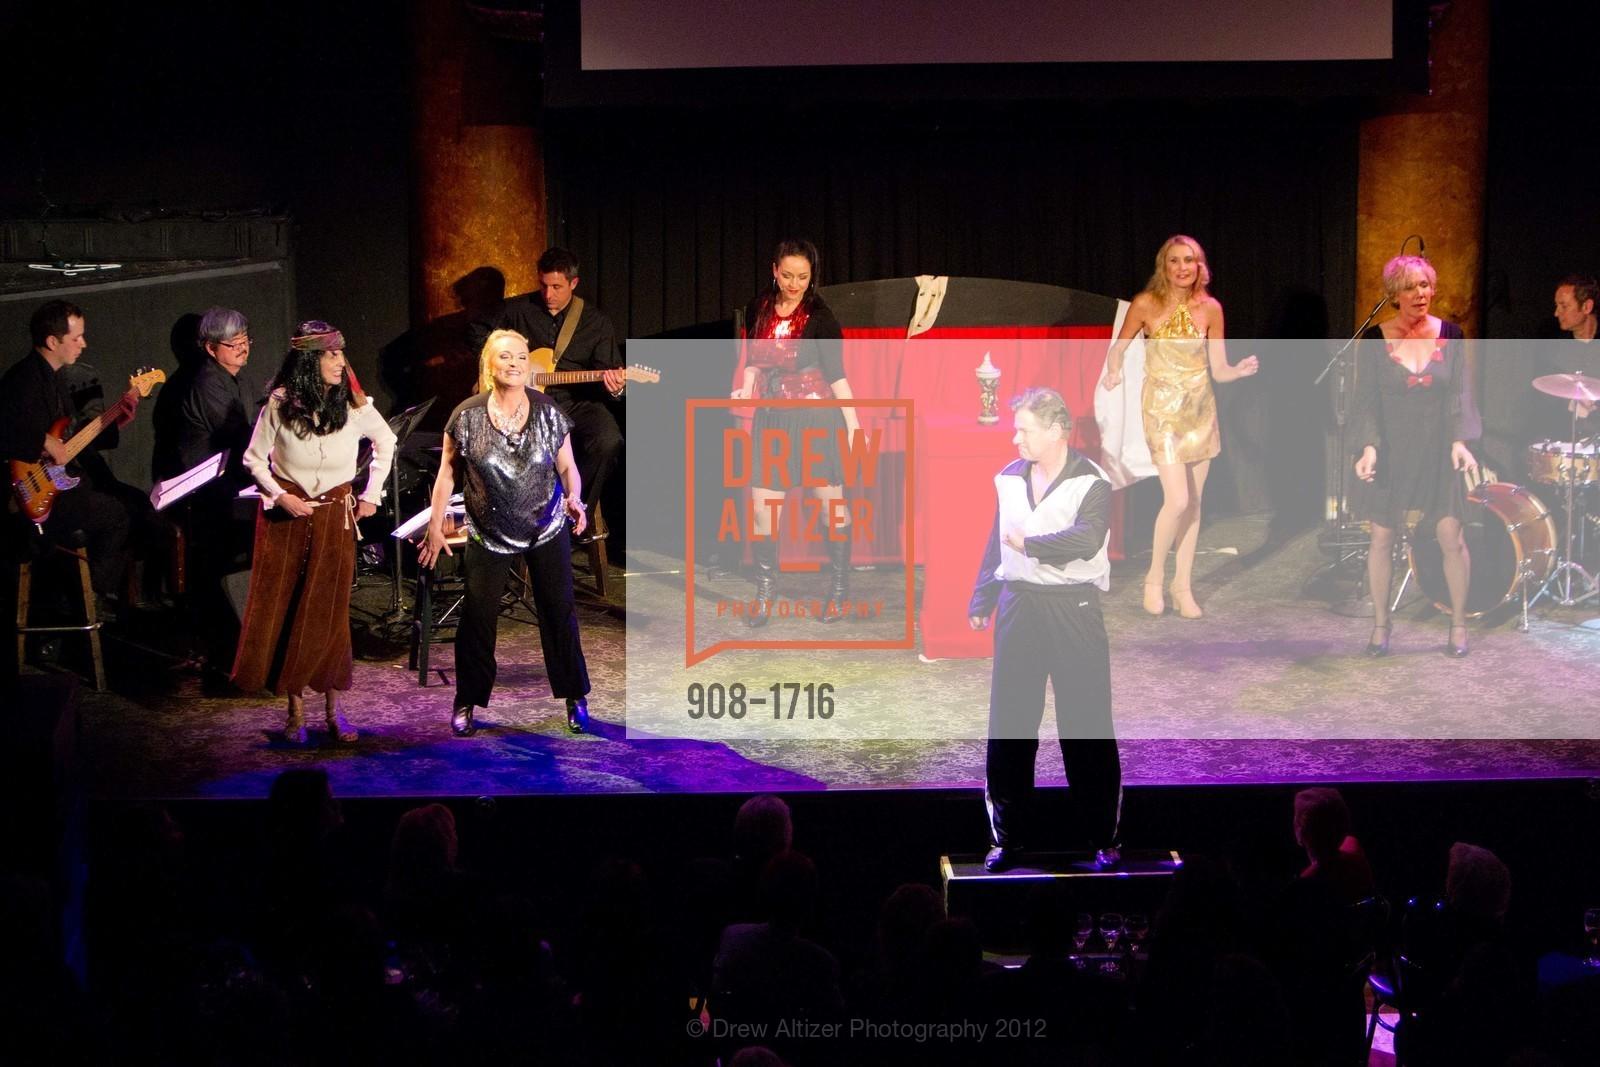 Performance, Photo #908-1716